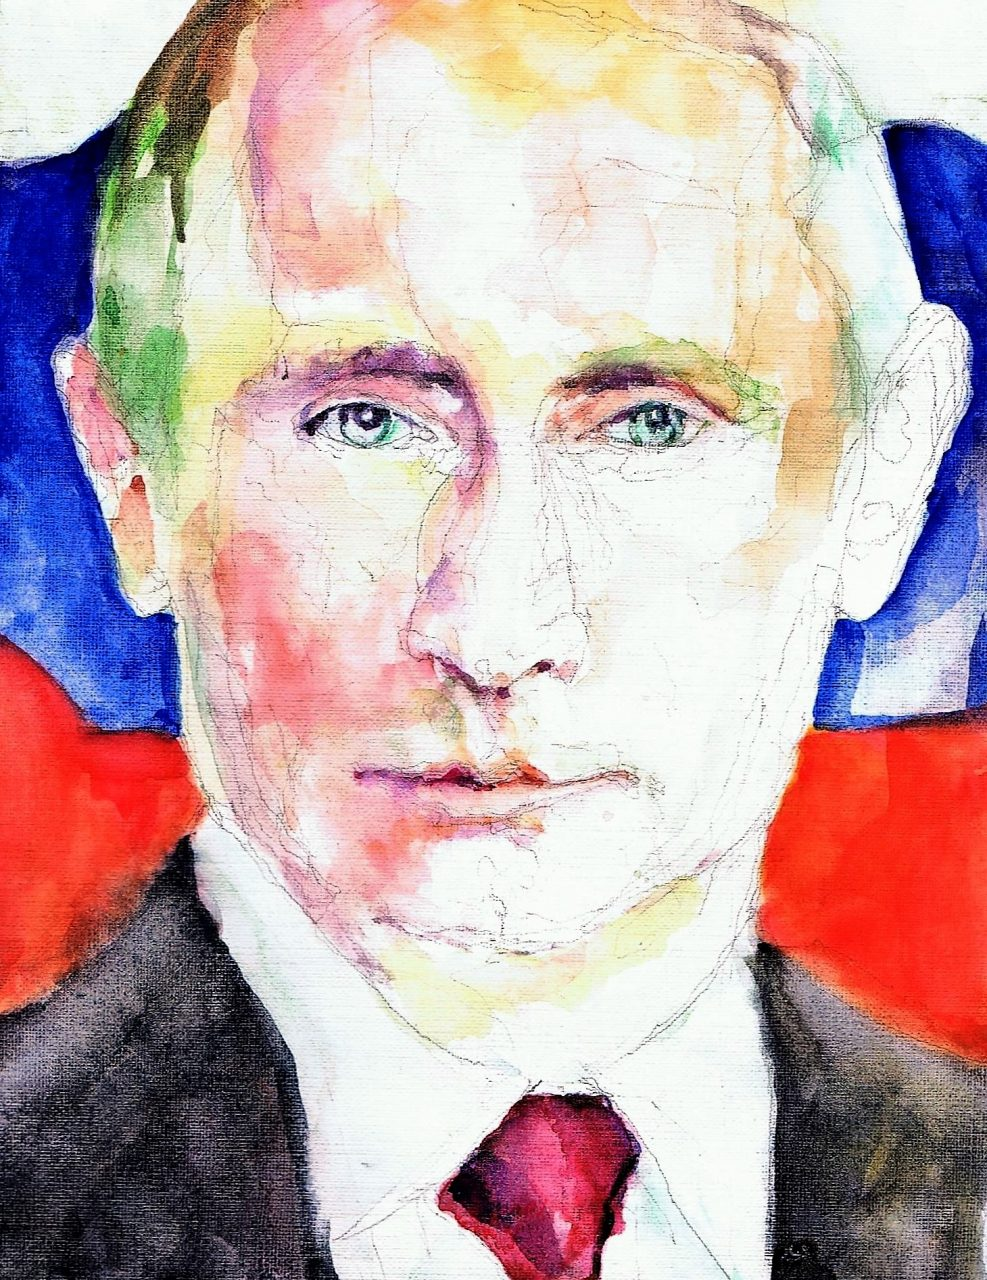 365 dagen een portret Vladimir Poetin, president USSR Aquarel 19c25